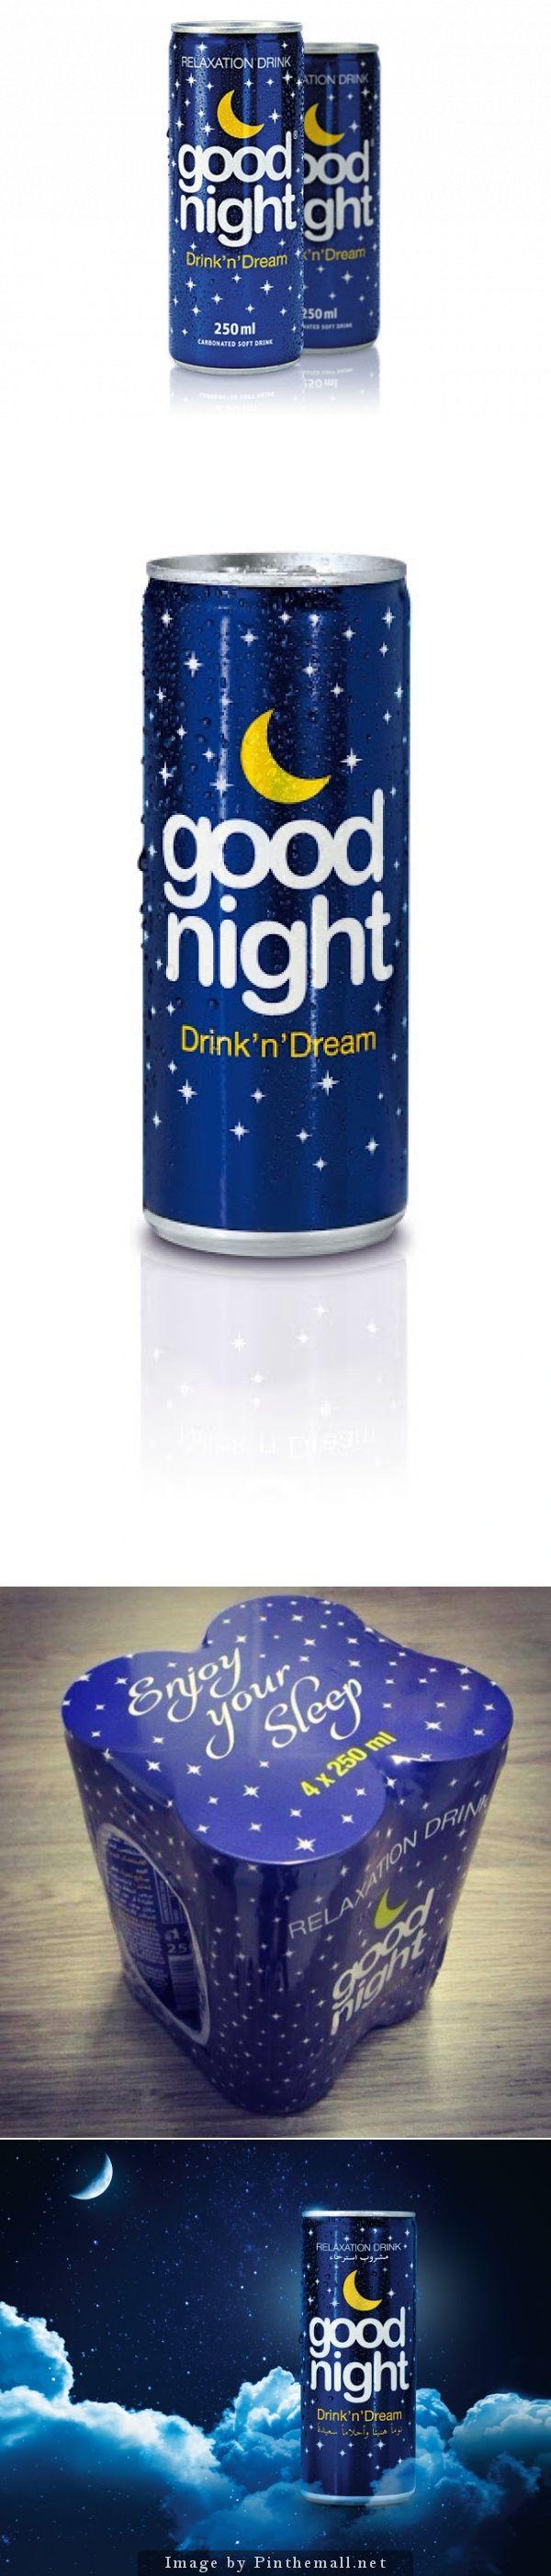 GoodNightDrink Drink'n'Dream